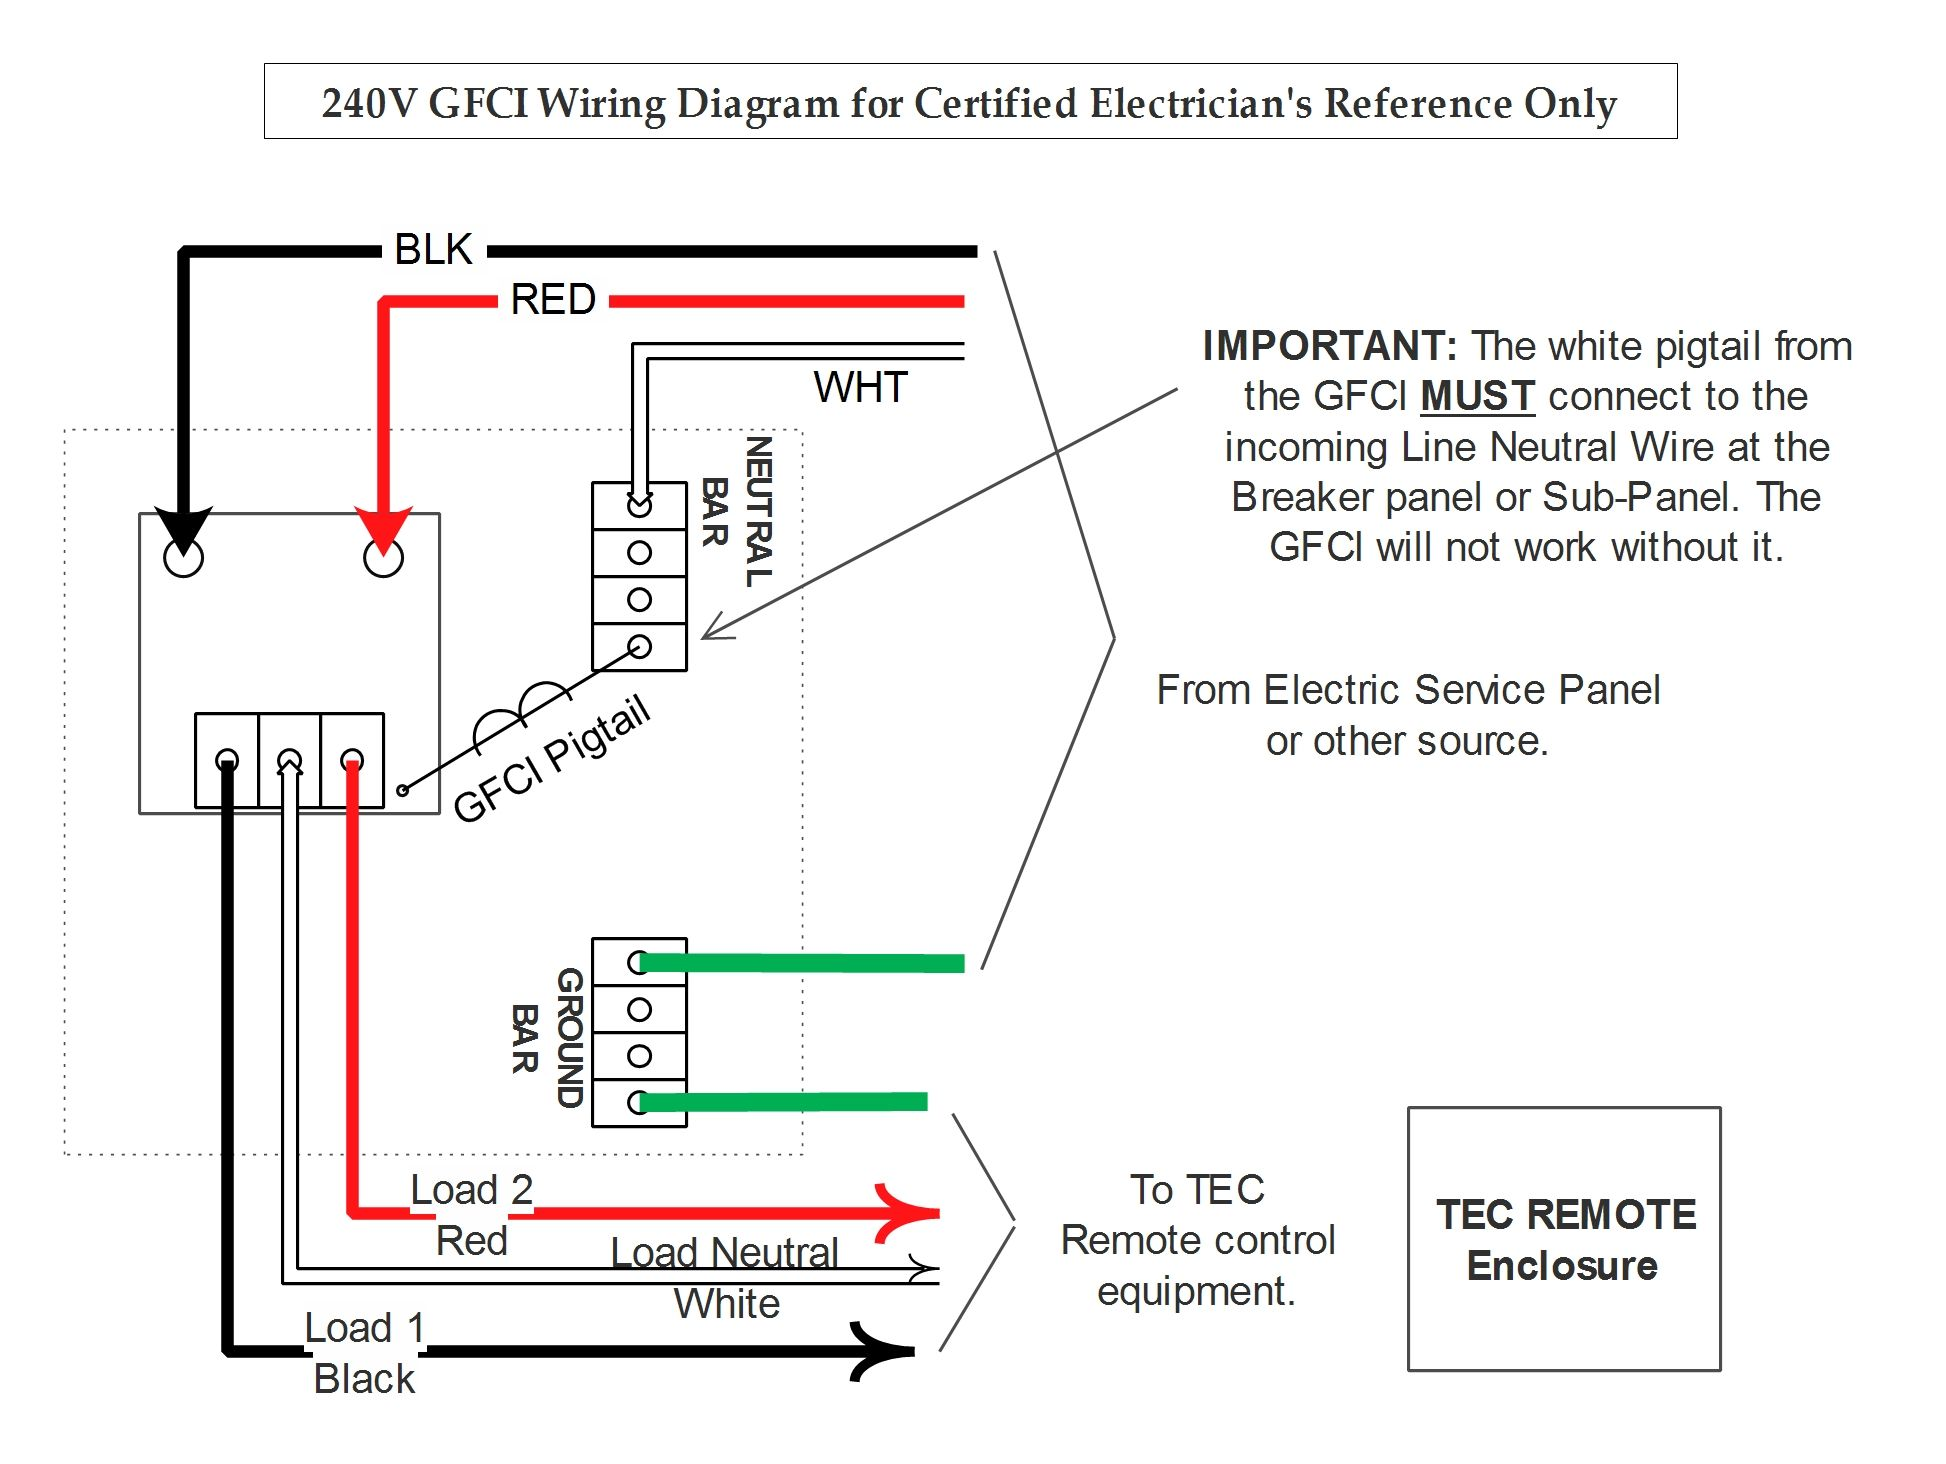 Boat Lift Switch Wiring Diagram: Automotive lift wiring  diagramrh:svlc.us,Design